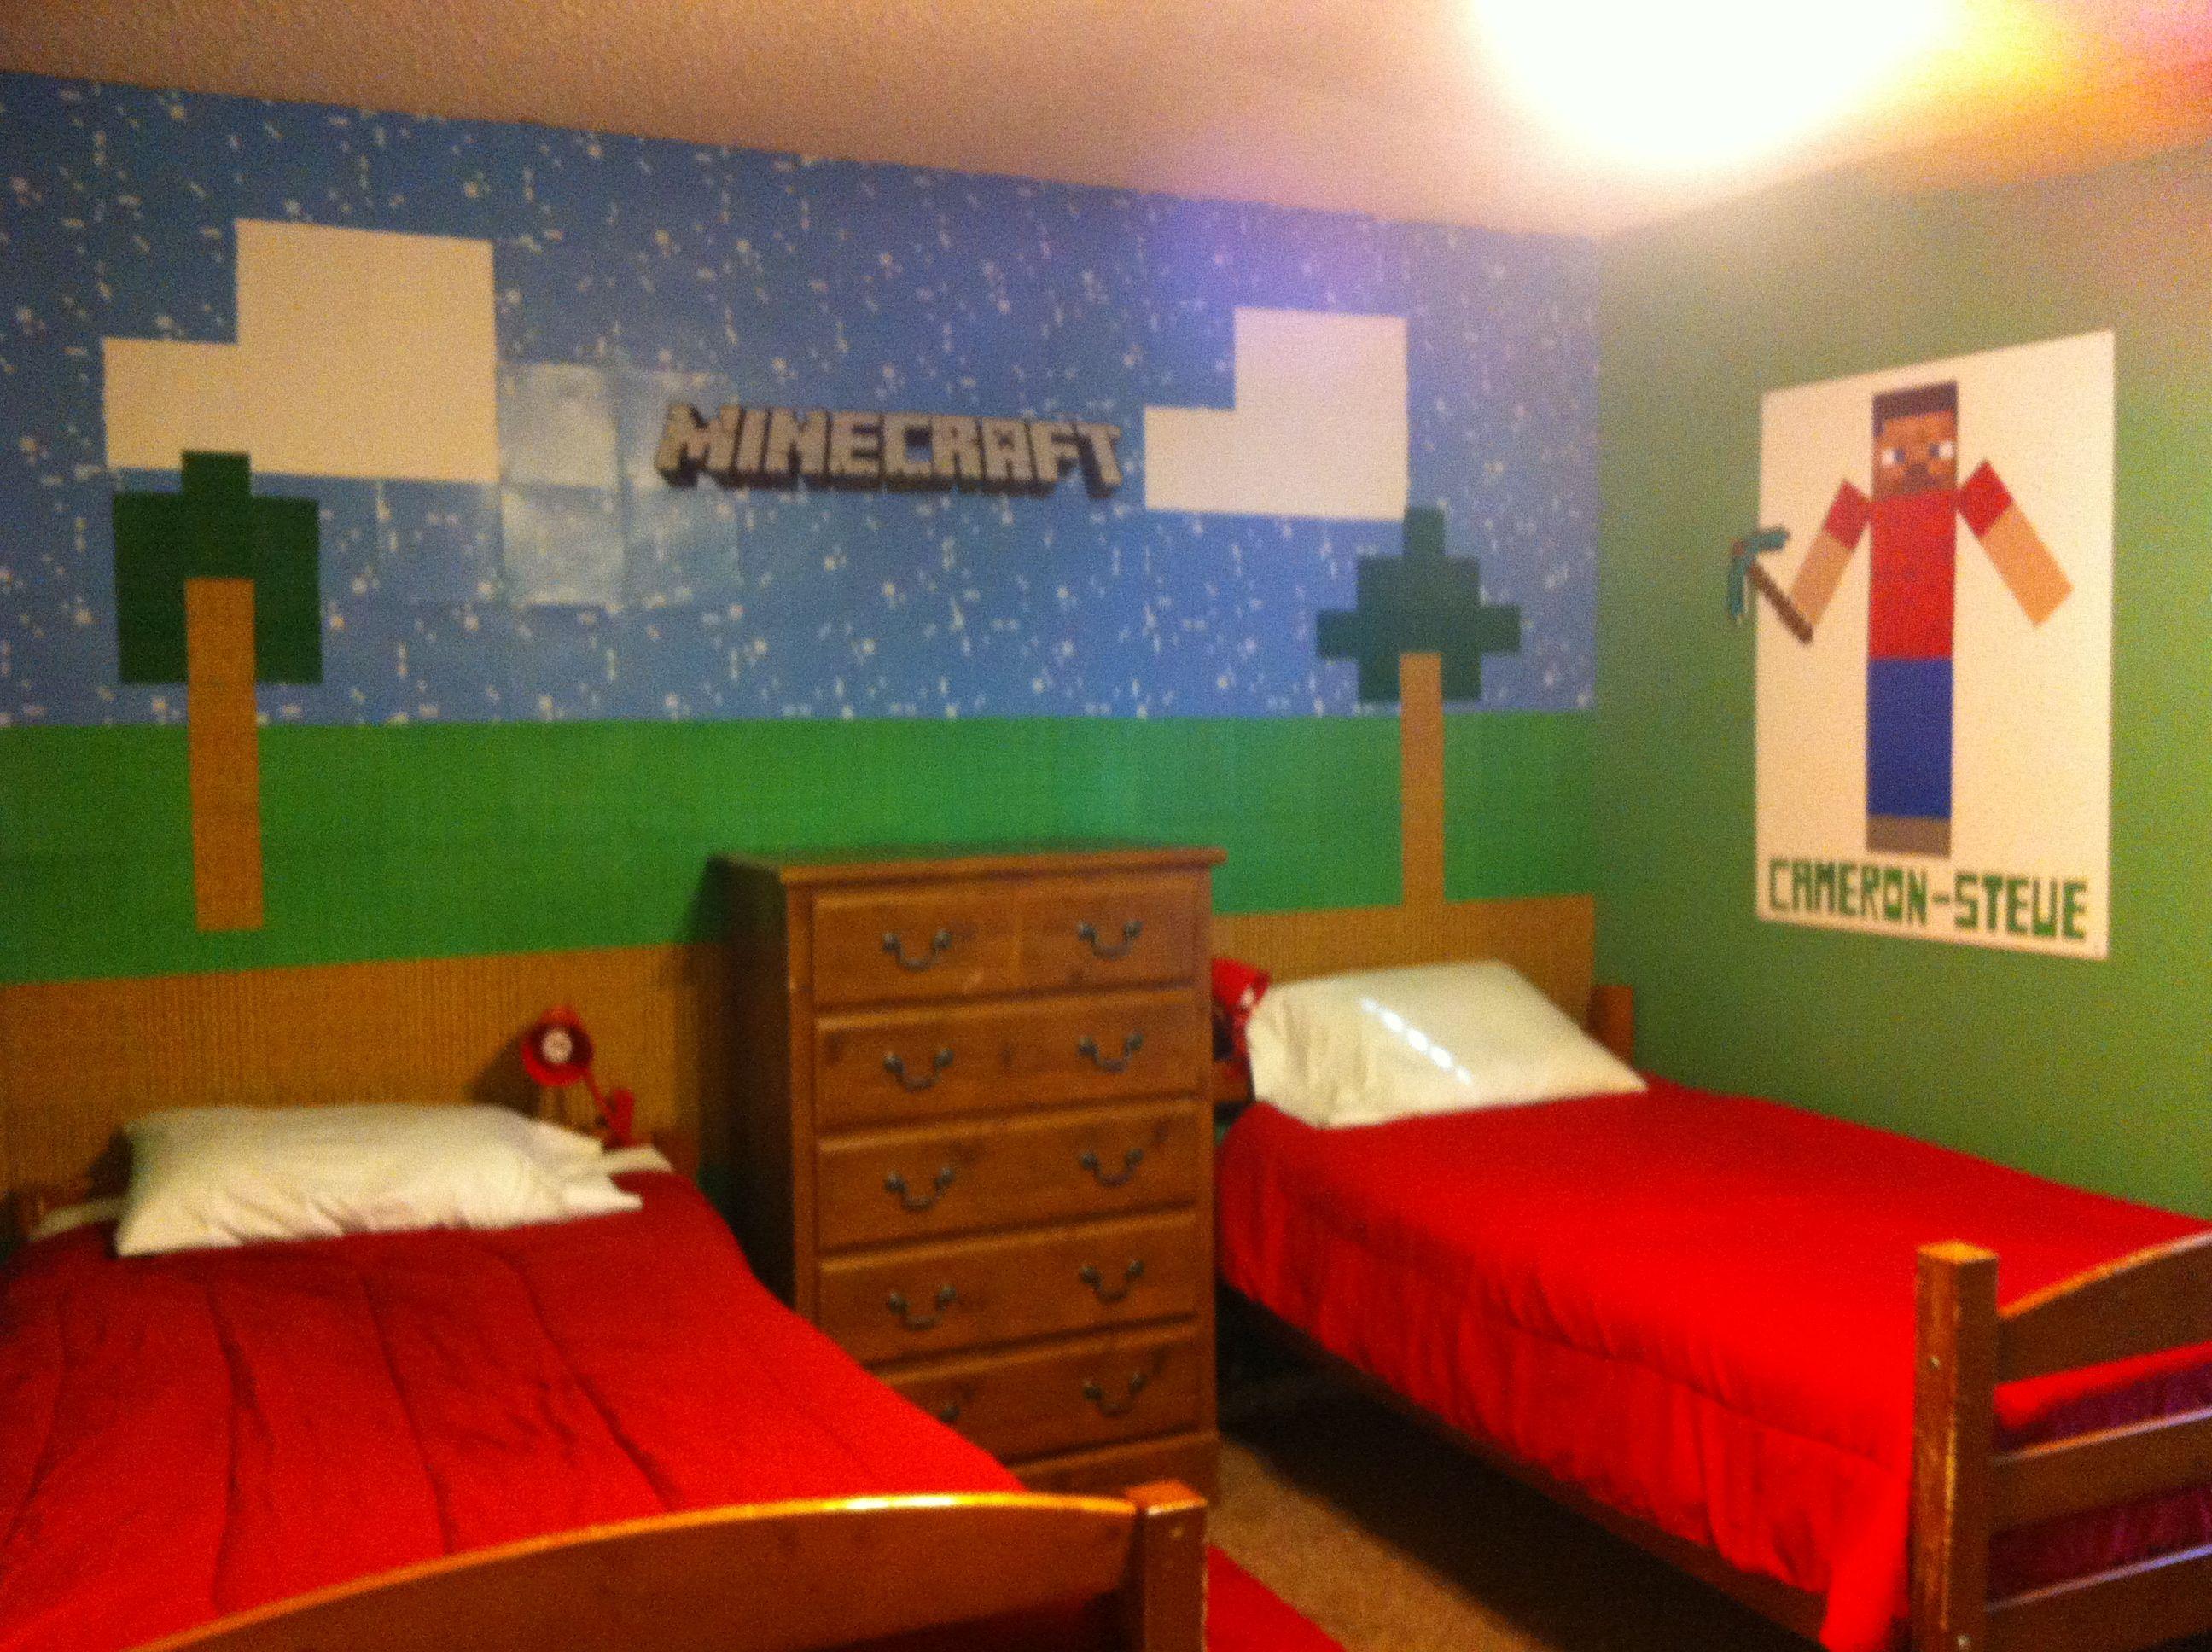 Minecraft room pic2 | INSPIRATION/ MINECRAFT | Pinterest